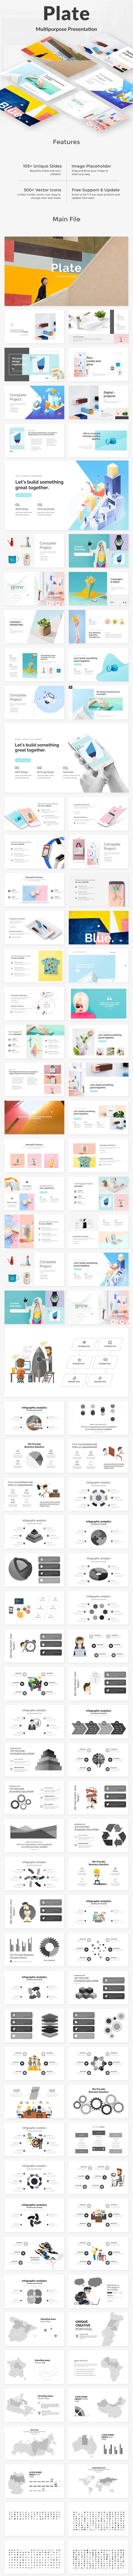 Plate Minimal Design Powerpoint Template - Creative PowerPoint Templates